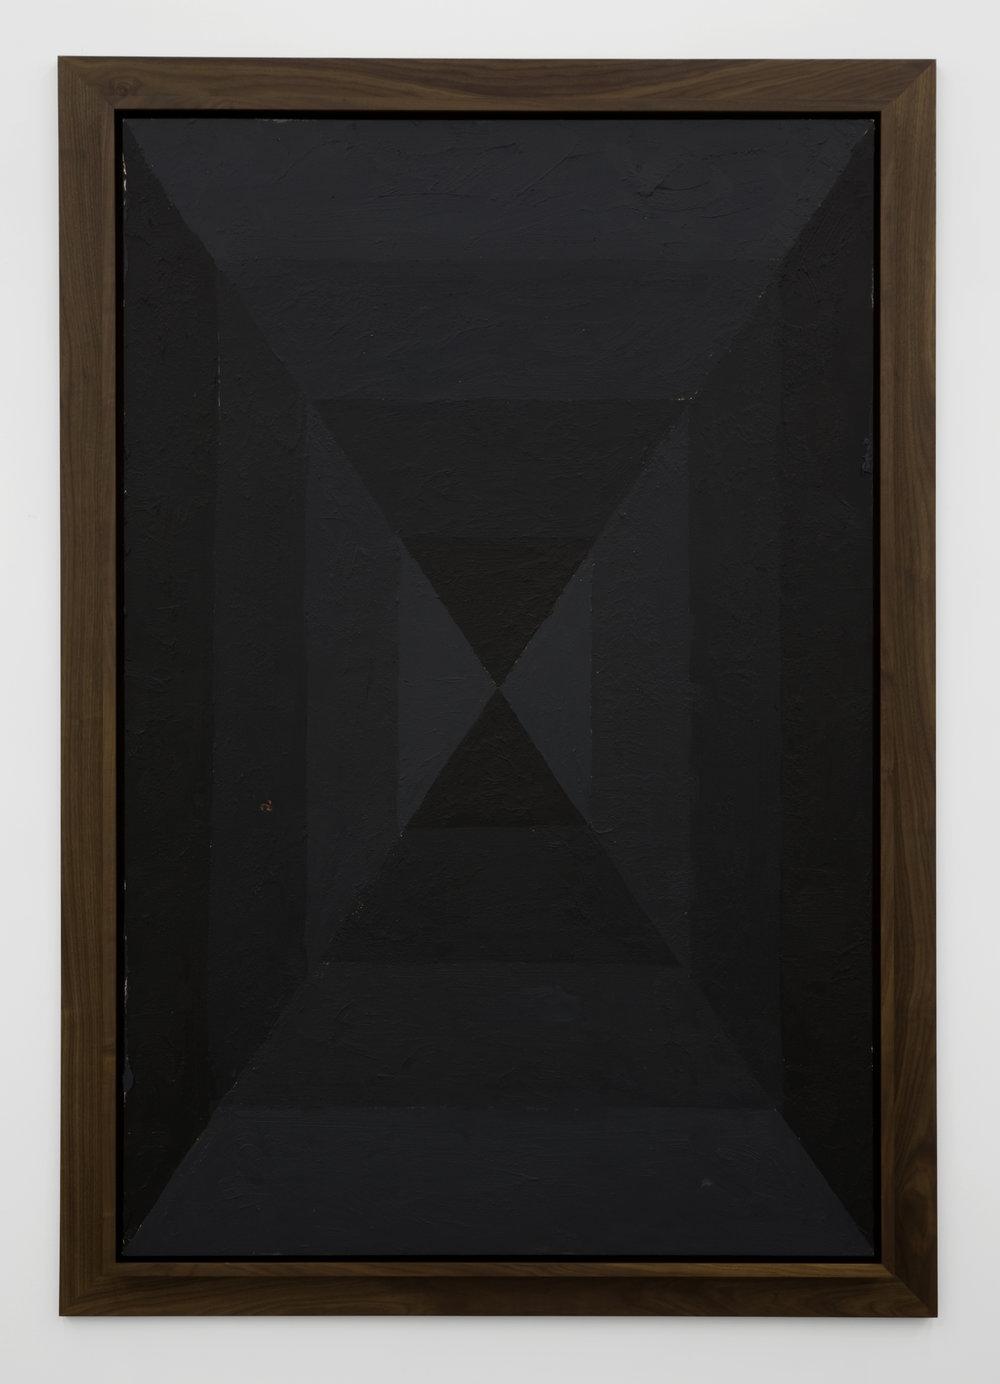 Julian Hoeber, Execution Changes #46 (XS, Q1, LMJ, DC, Q2, RMJ, LC, Q3, UMJ, DC, Q4, LMJ, LC), 2012 acrylic on panel 193,5 x 135,5 cm - 76 1/8 x 53 3/8 inches